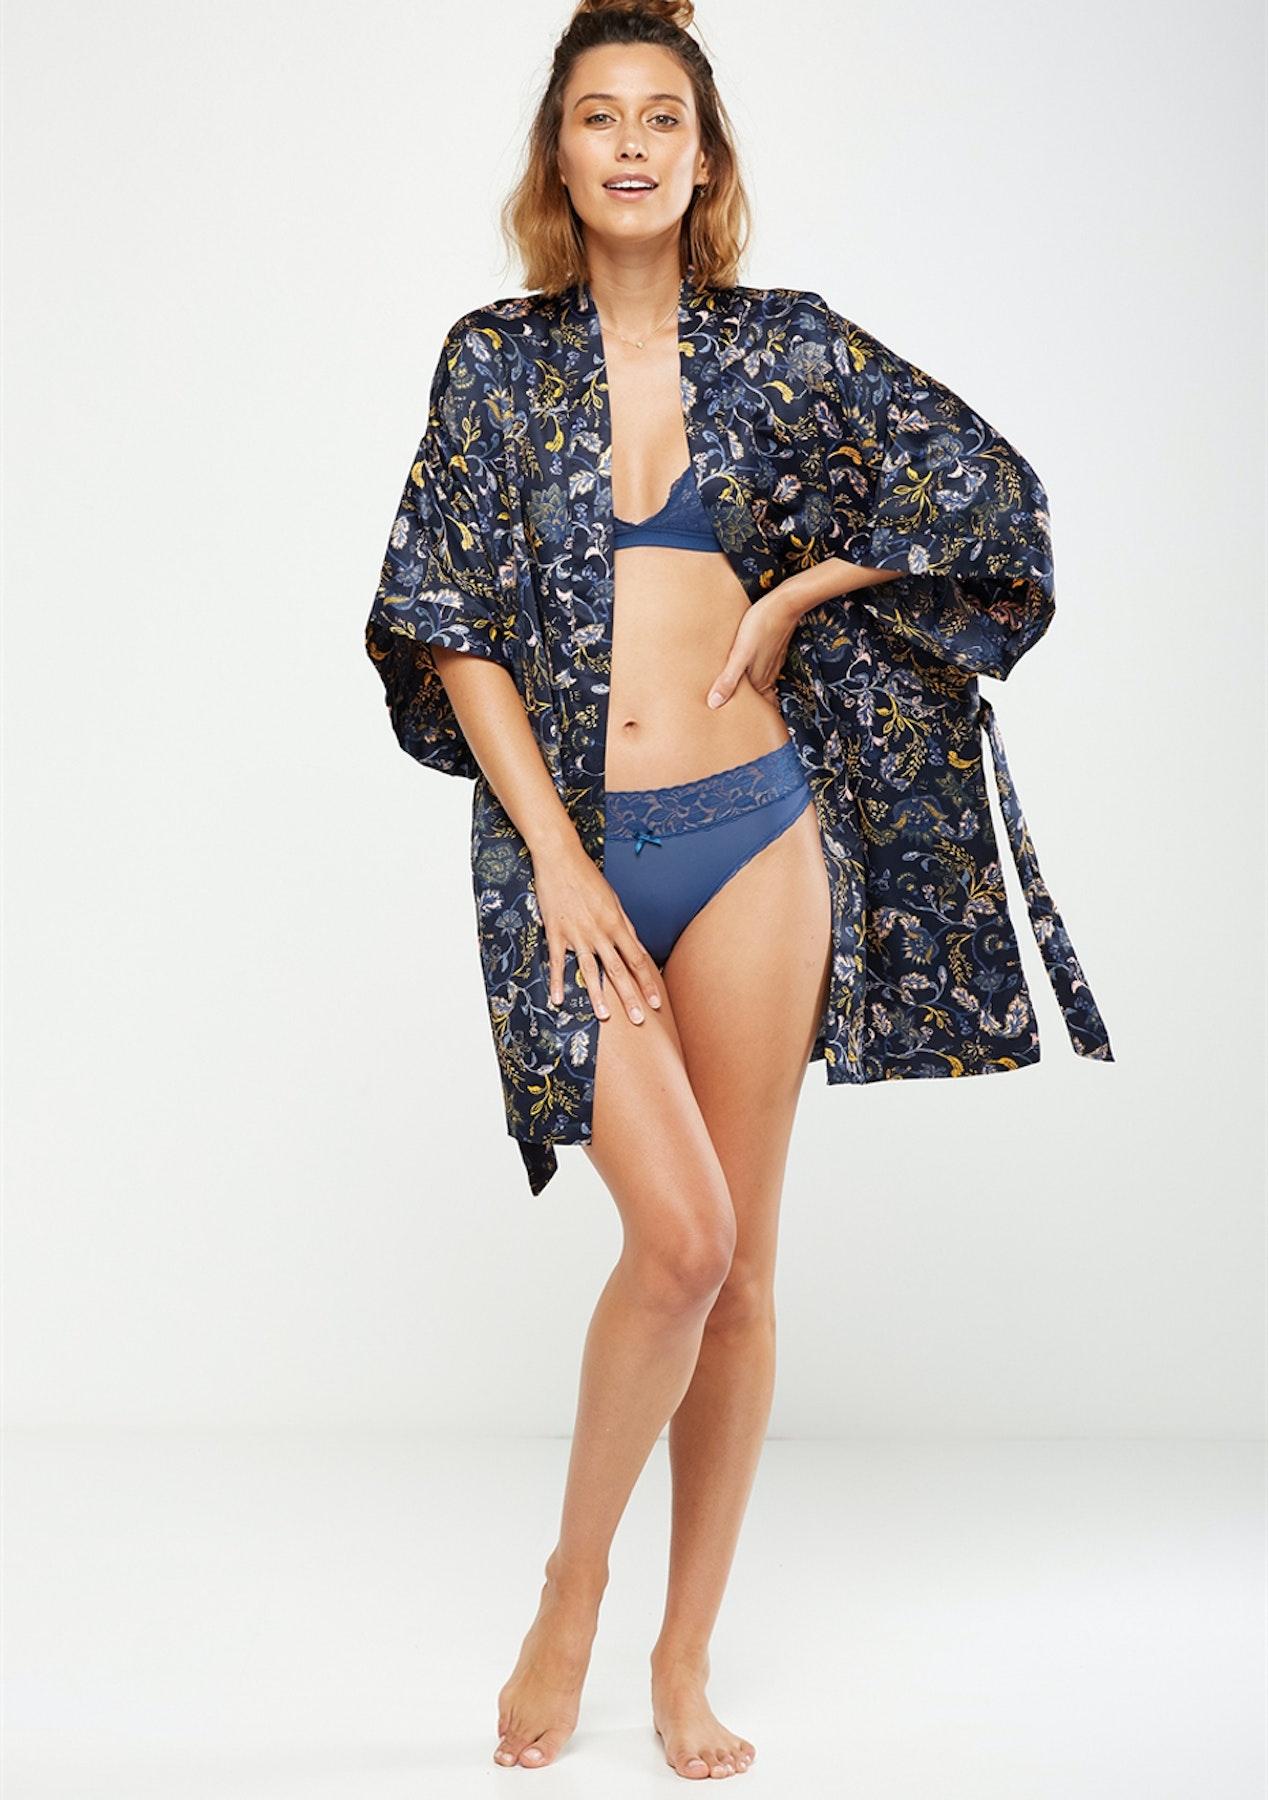 a6e2eb1b7b Cotton On Body - Kimono Gown/Ornate Harvest Midnight